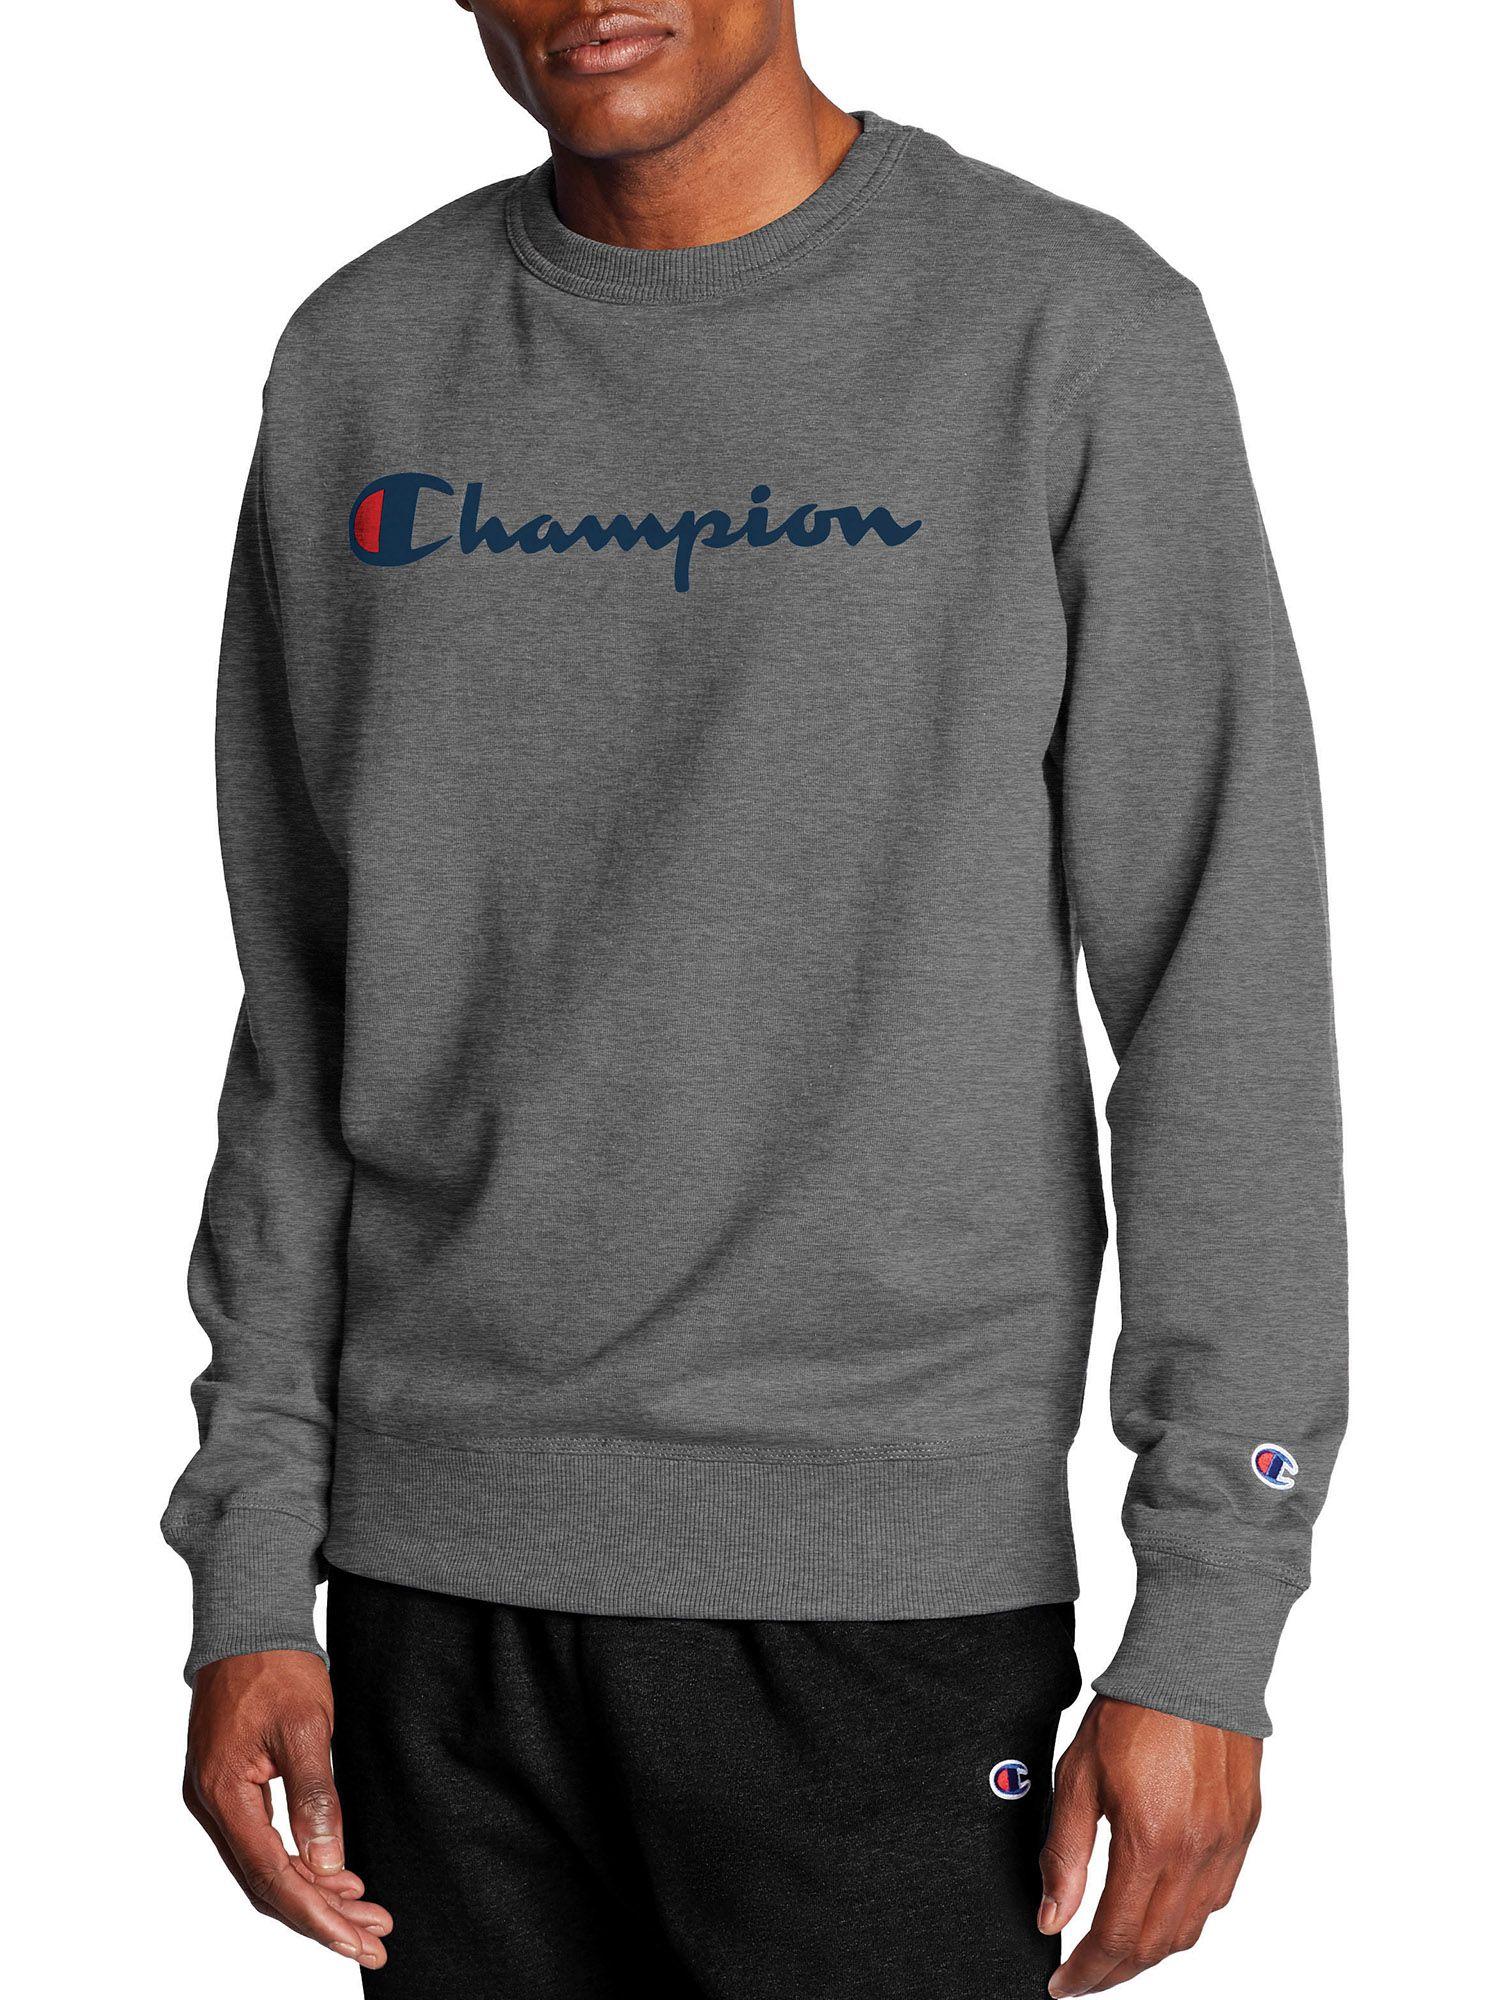 Champion Champion Men S Powerblend Graphic Crew Sweatshirt Walmart Com Graphic Crew Neck Sweatshirts Crew Neck Sweatshirt Sweatshirts [ 2000 x 1500 Pixel ]